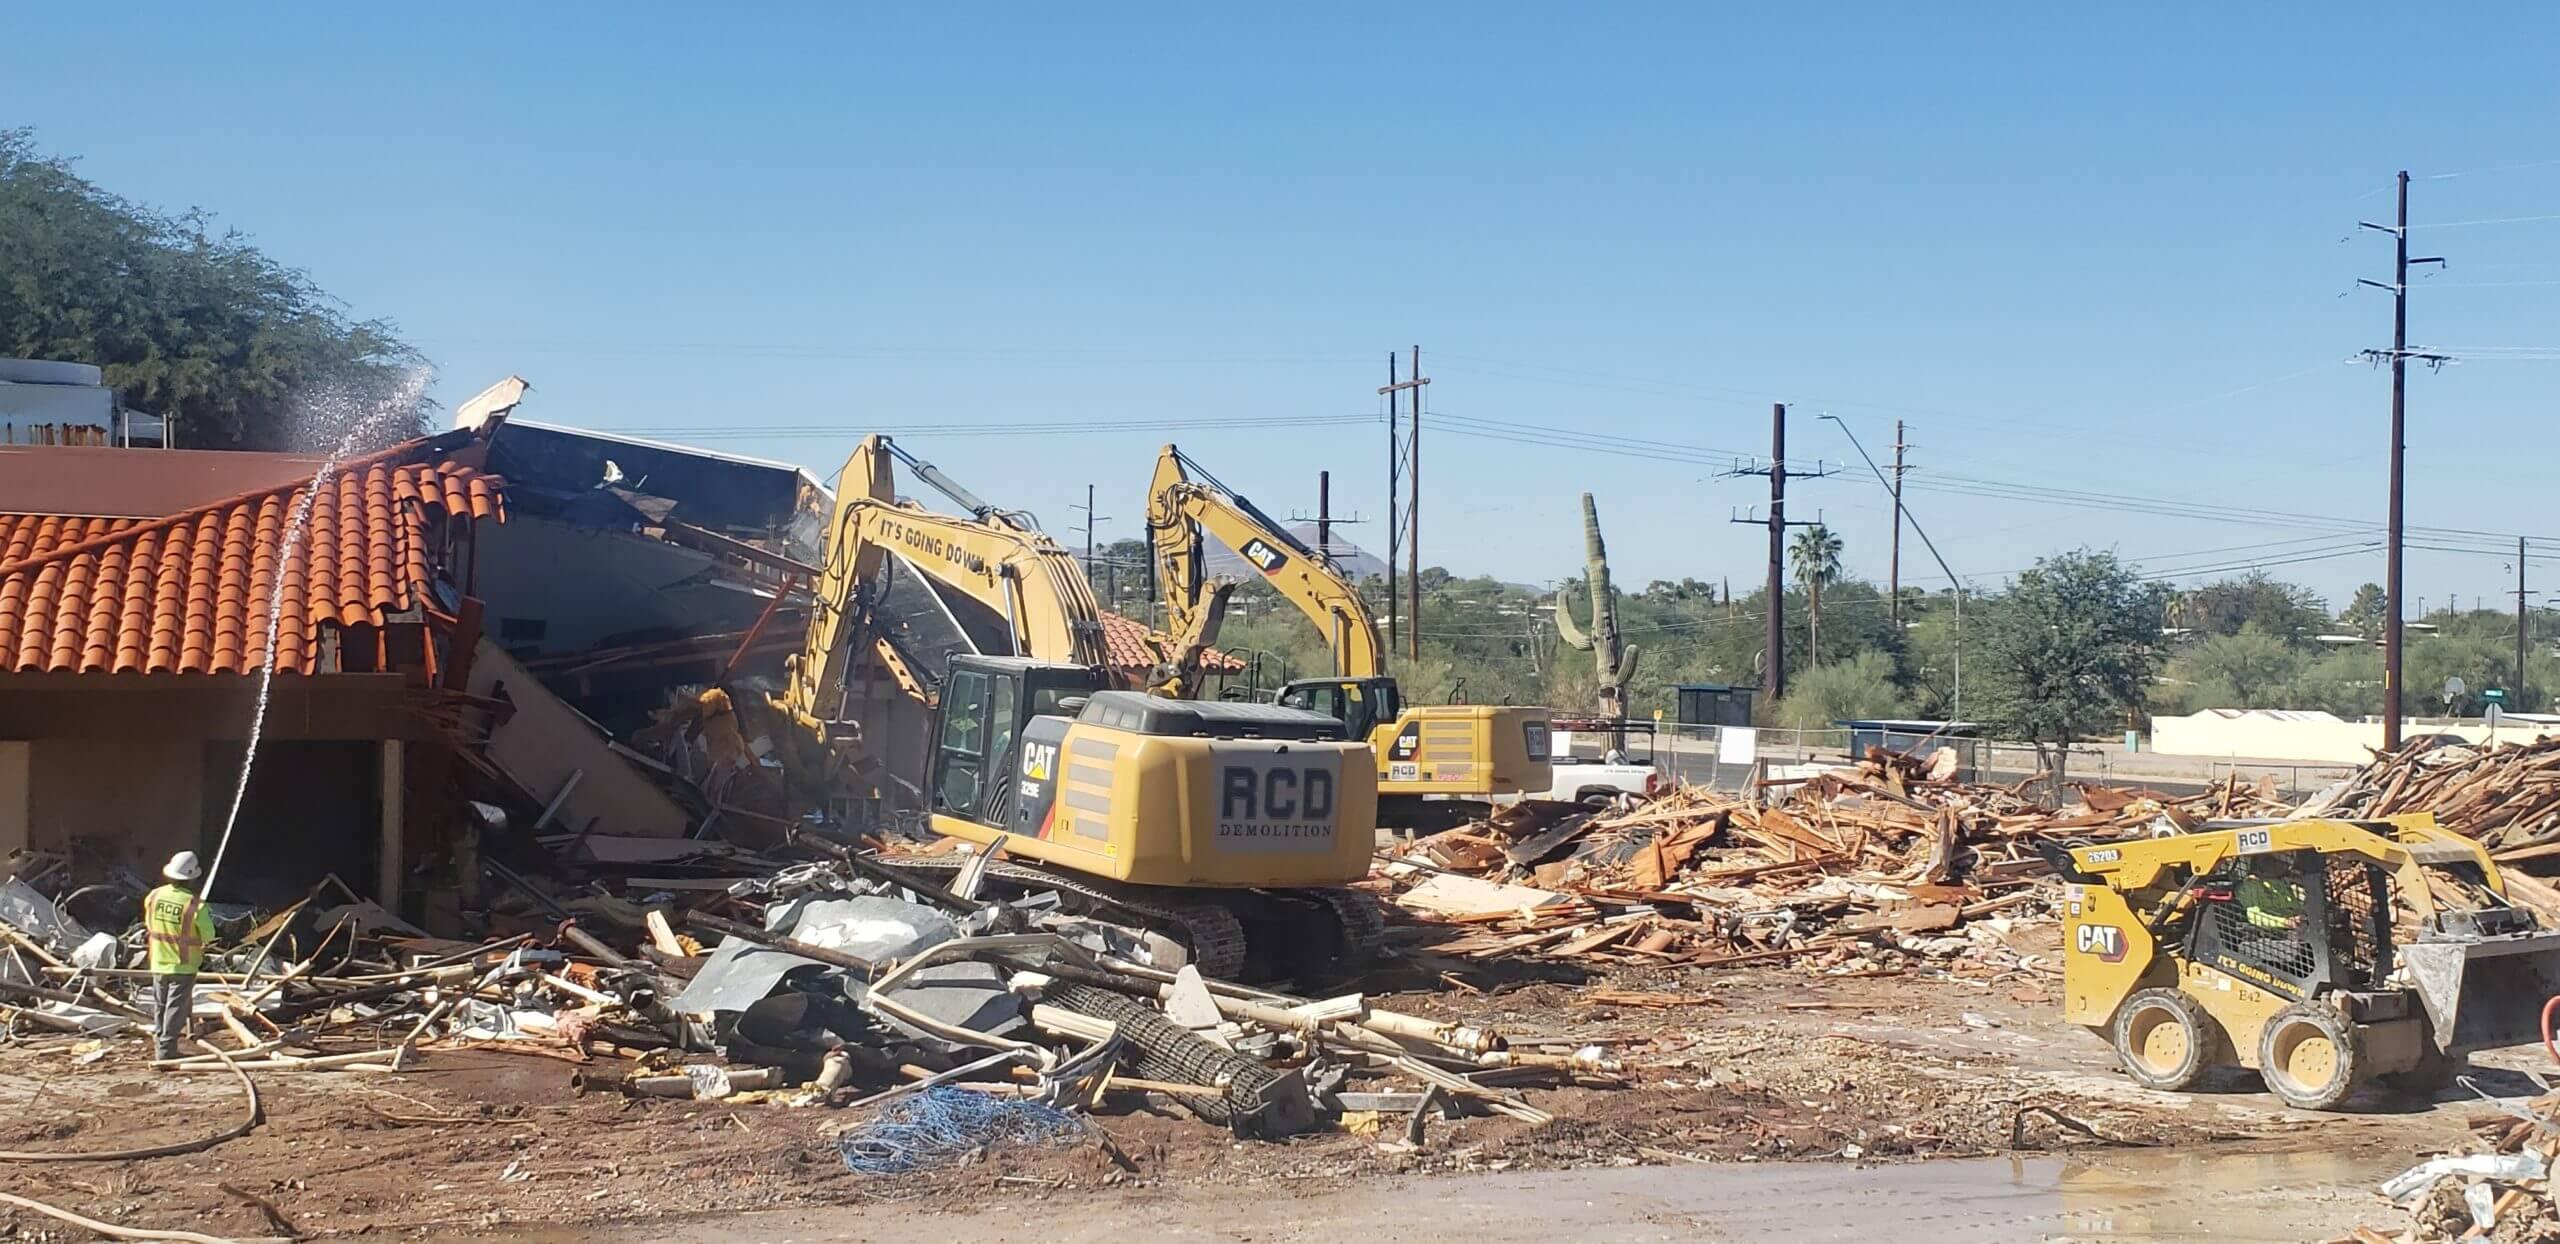 Expert Commercial Demolition Services